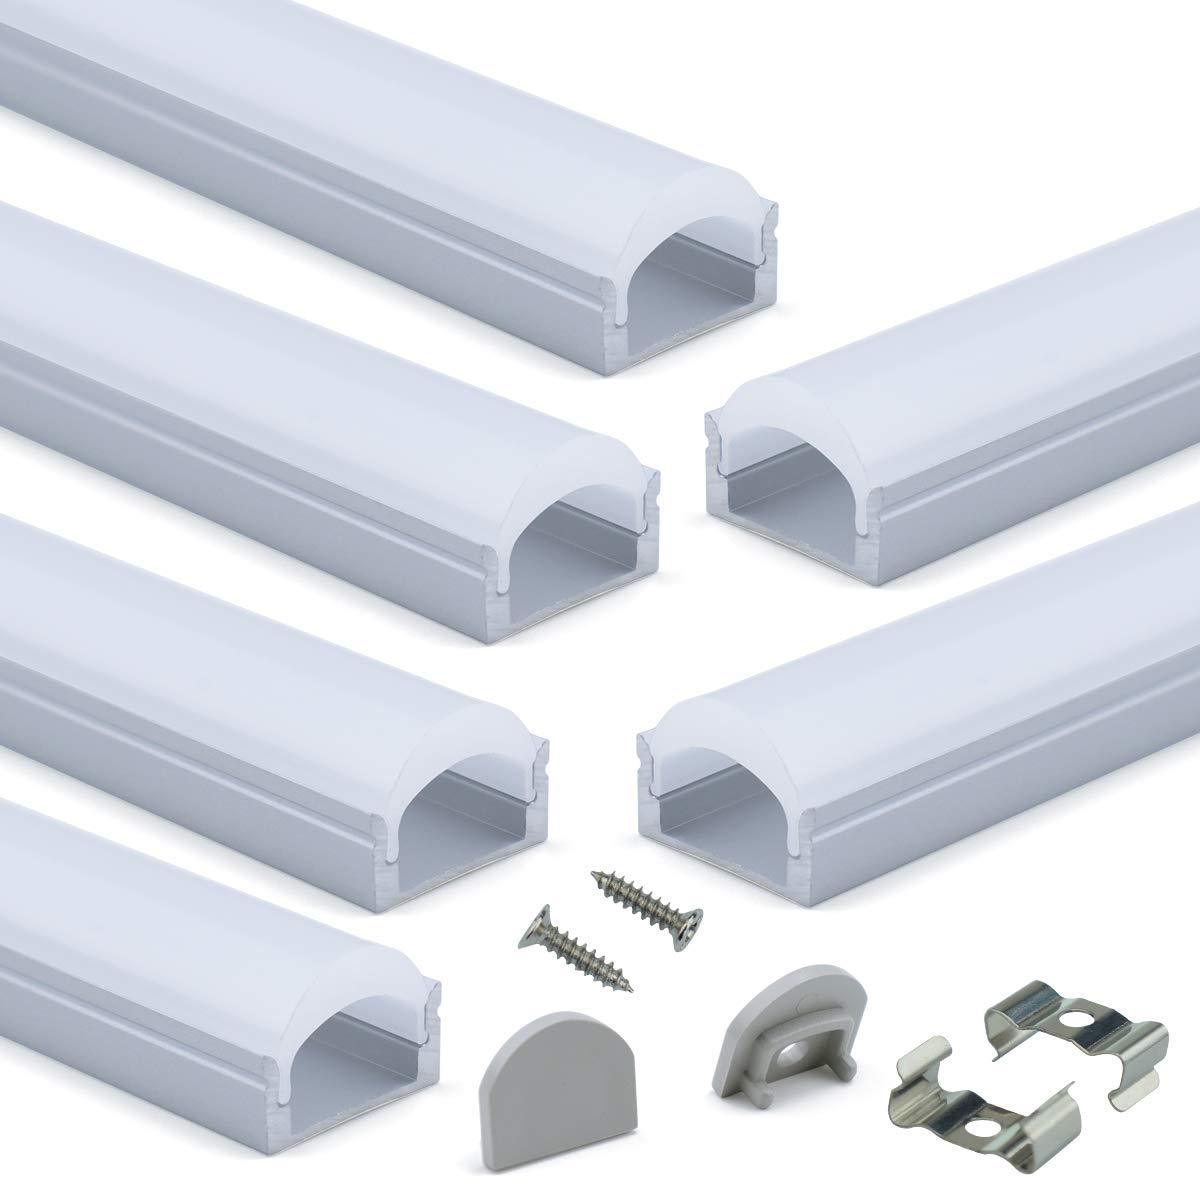 Muzata 6-Pack 3.3ft/1Meter 9x17mm U Shape LED Aluminum Channel System with 60° Curved plexiglass Transparent U107,Series LU2 LN1 by Muzata